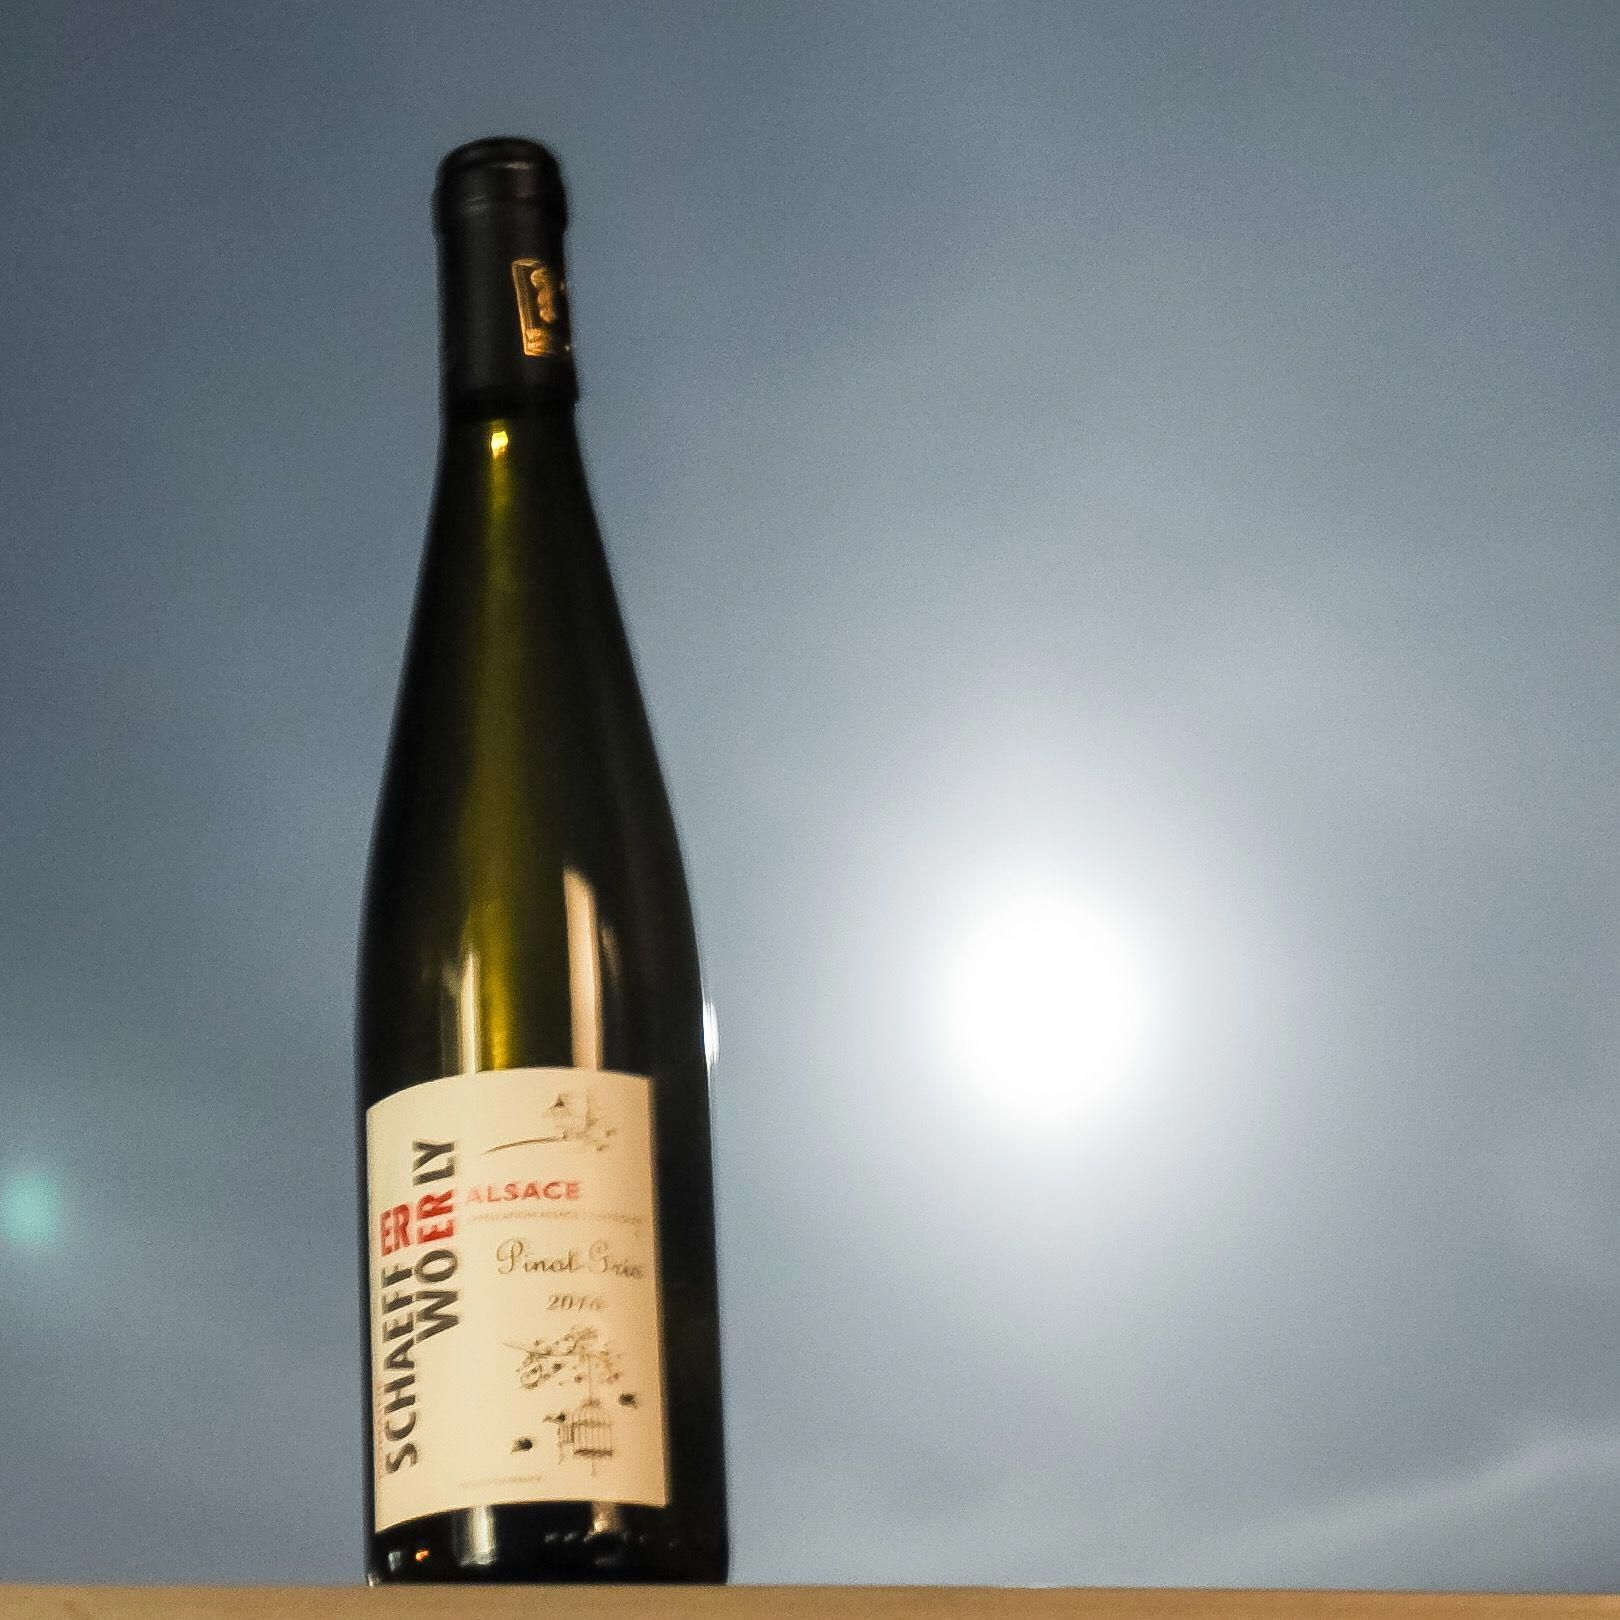 Pinot Gris Schaeffer Woerly Moonlight Frenchay Organic Vegan Bristol White Wine Alsace Wineglasses Wine Pinot Gris Pinot